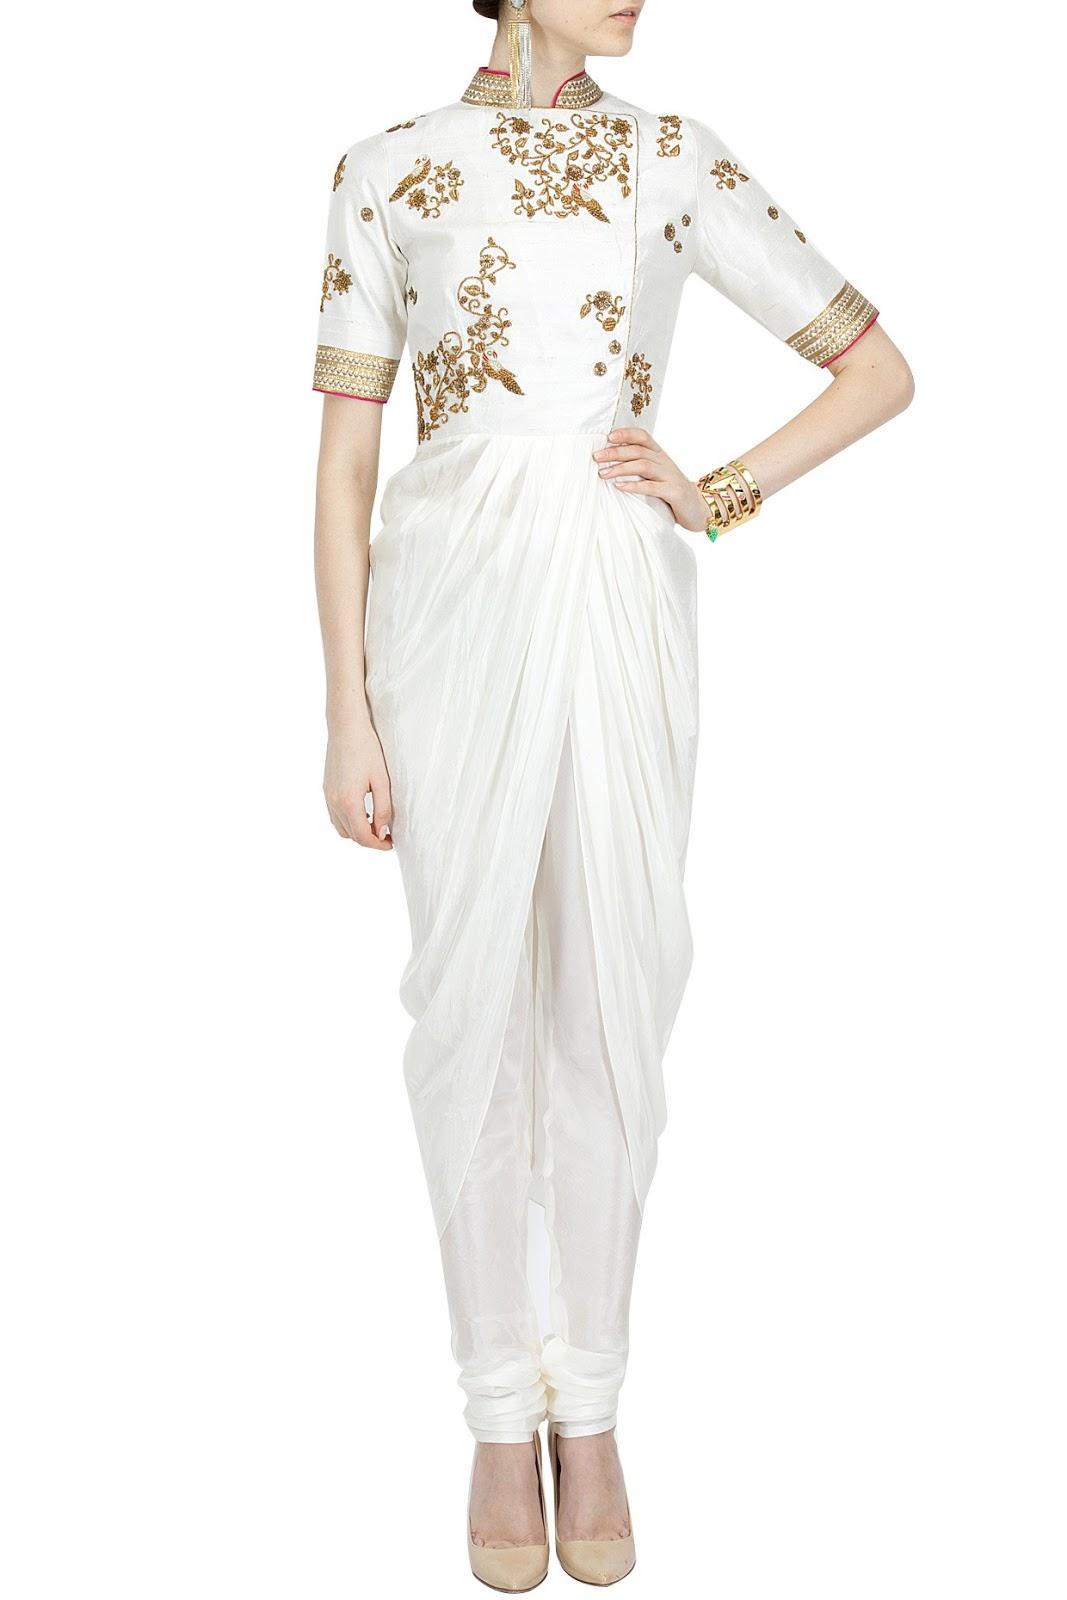 Tisha Saksena's Indo Western Dresses